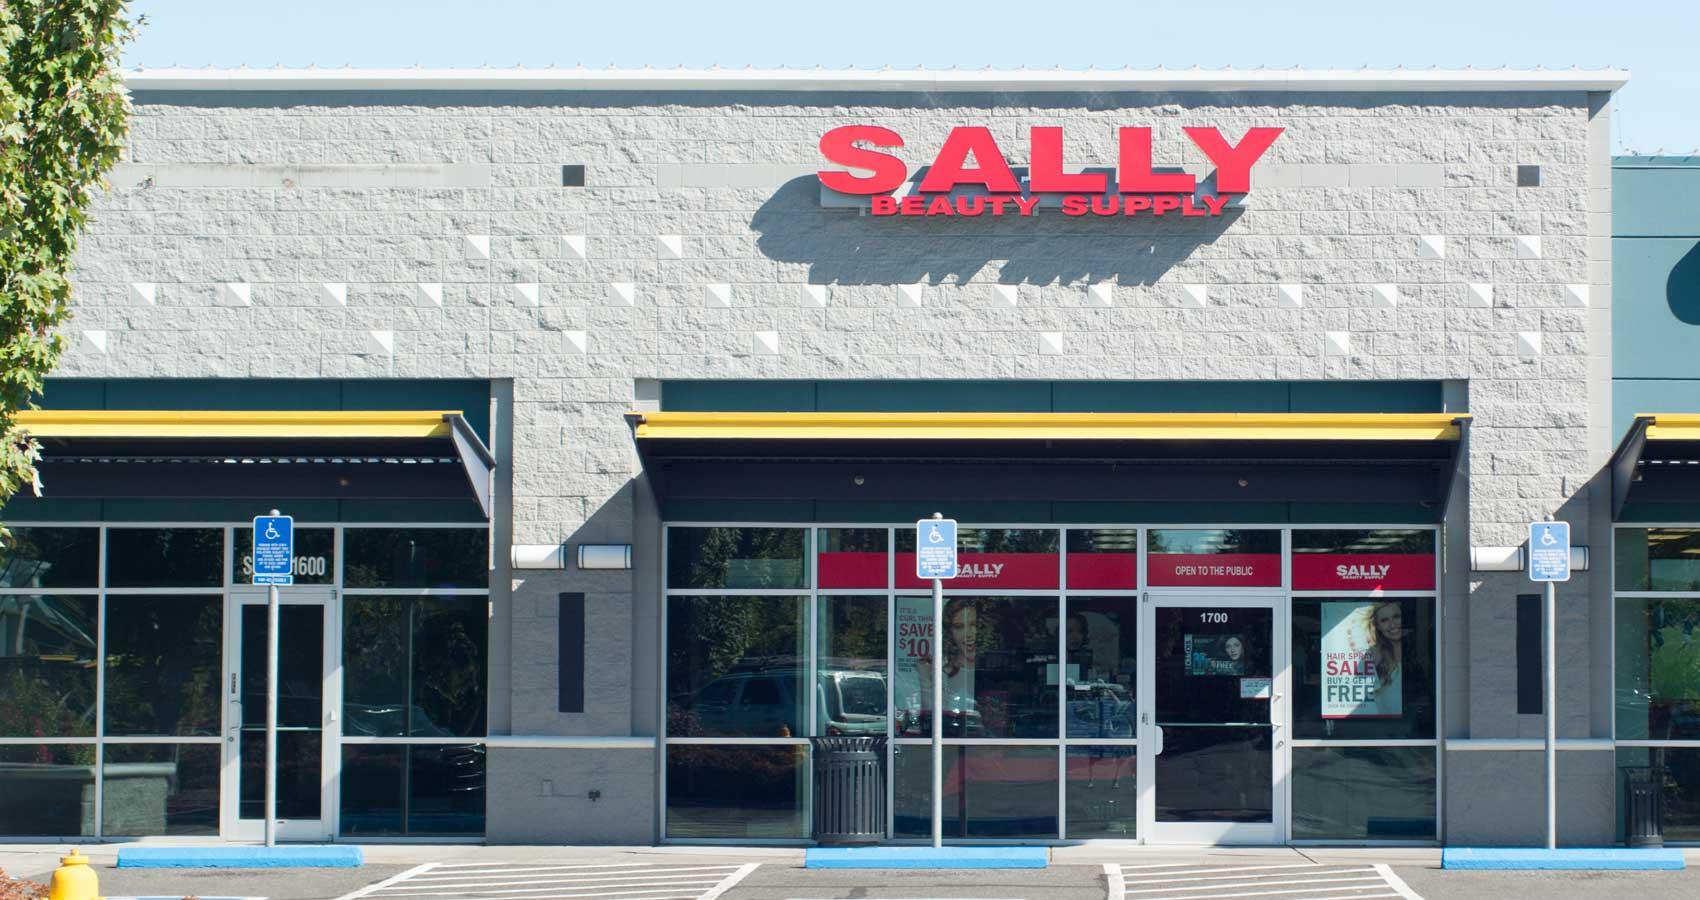 sally beauty supply near me, sallys beauty hours, Sally's beauty supply hours, Beauty supply near me